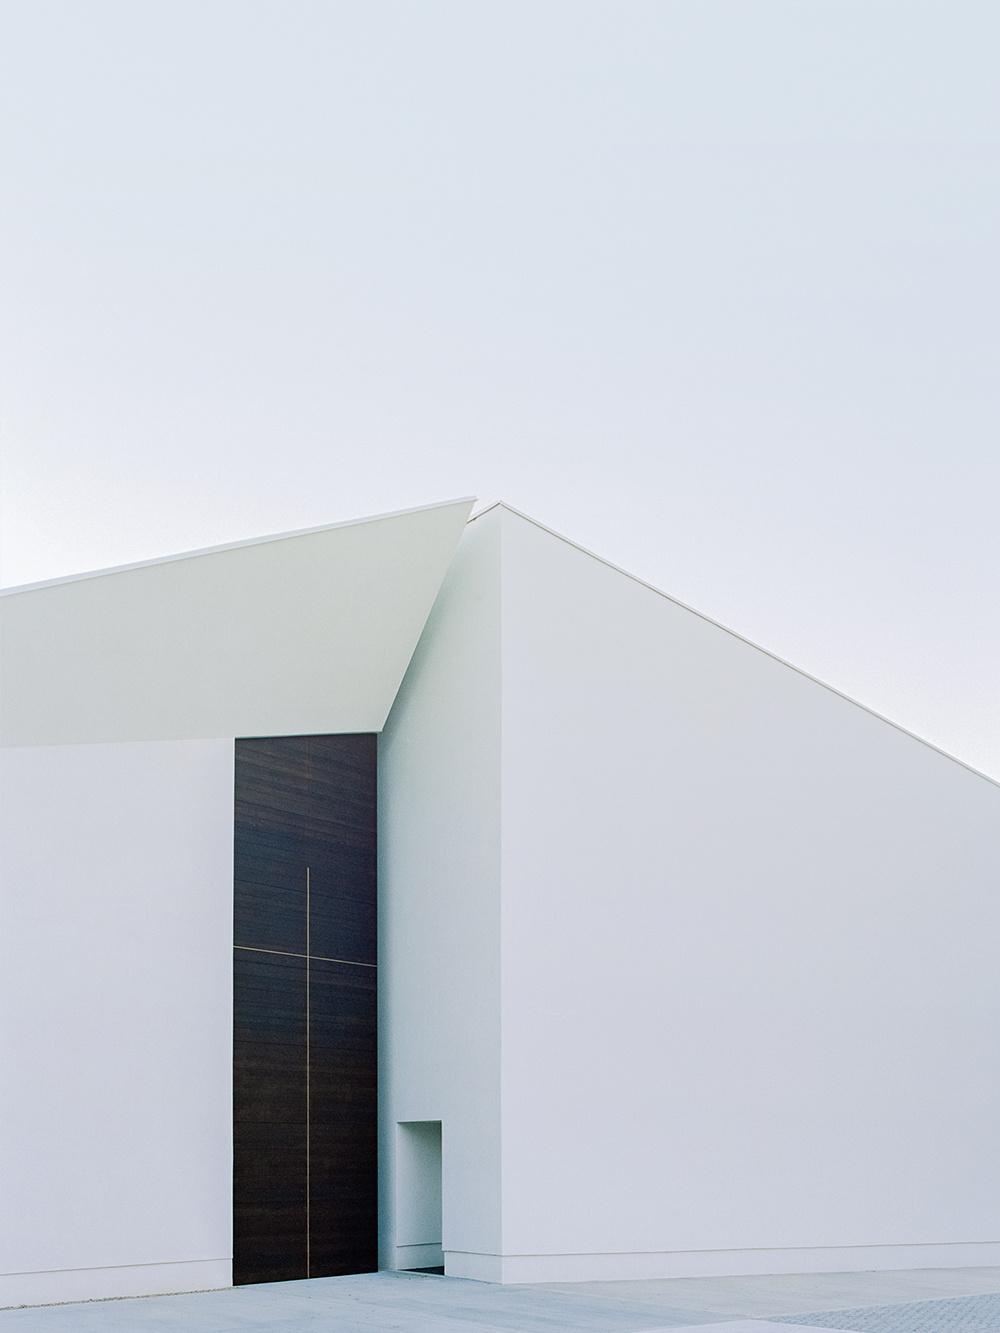 The Church of the Penitent Thief by INOUTarchitettura, LADO architetti and LAMBER + LAMBER